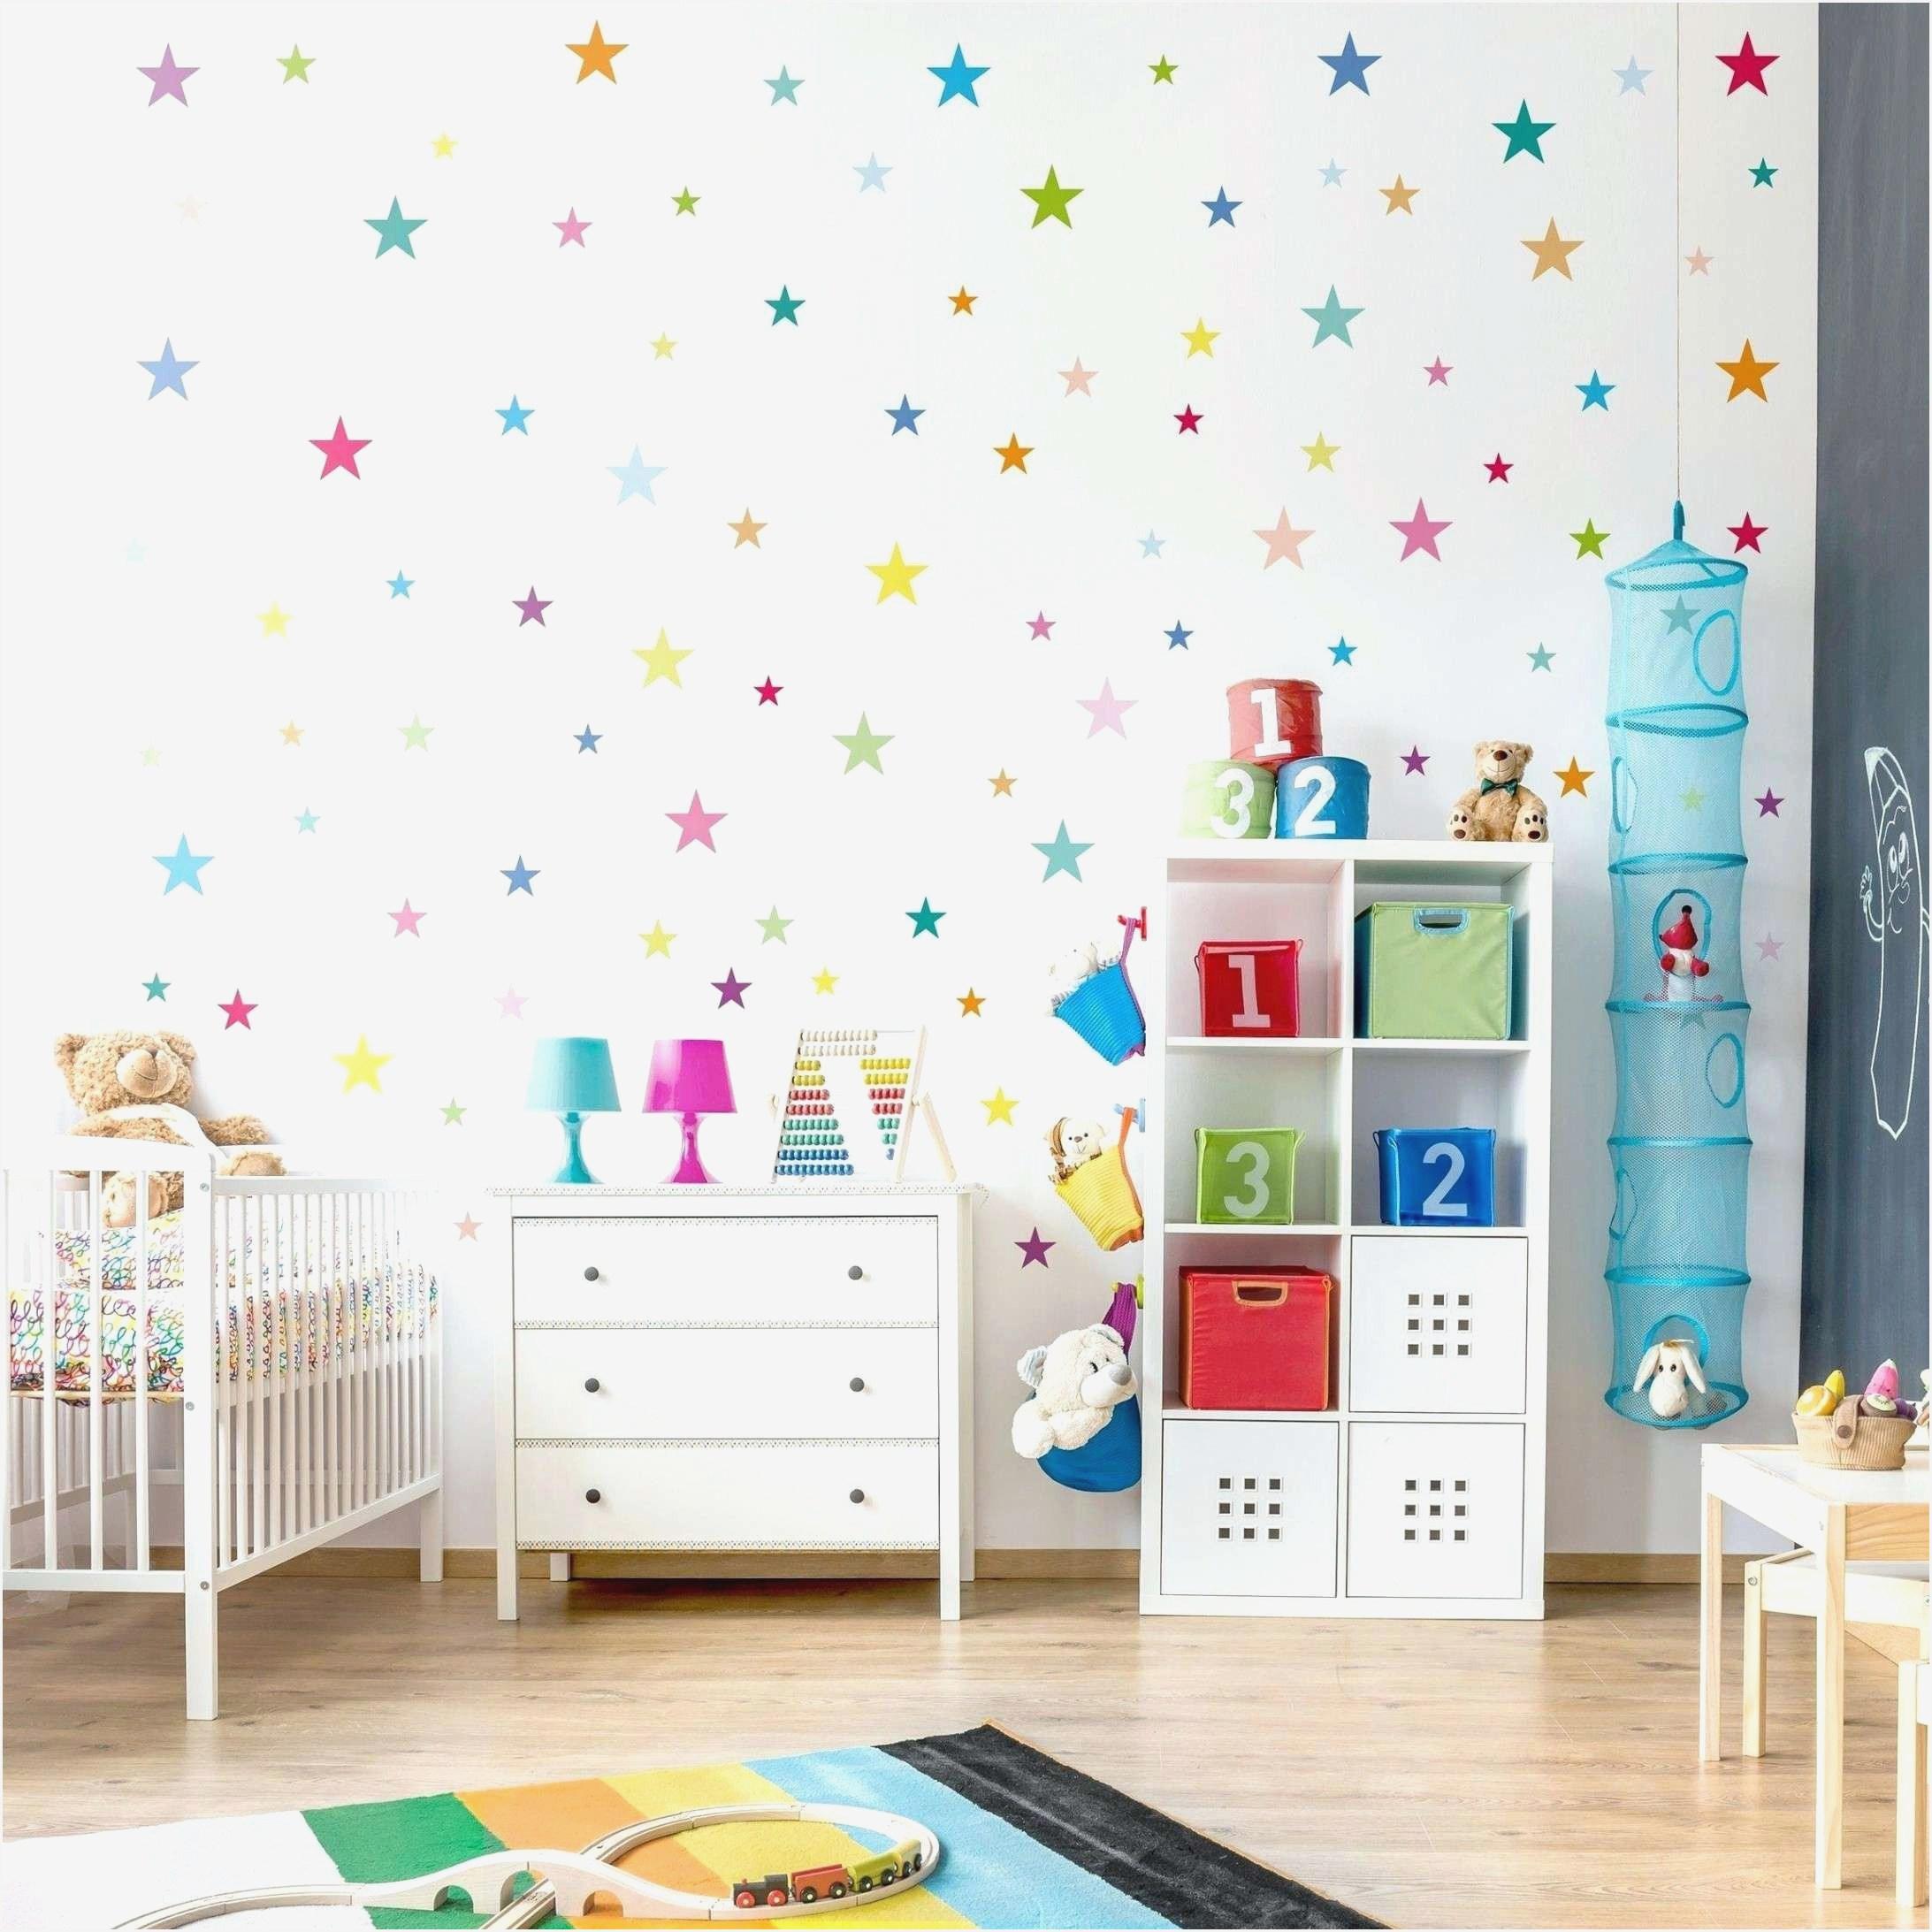 Playmobil Möbel Kinderzimmer